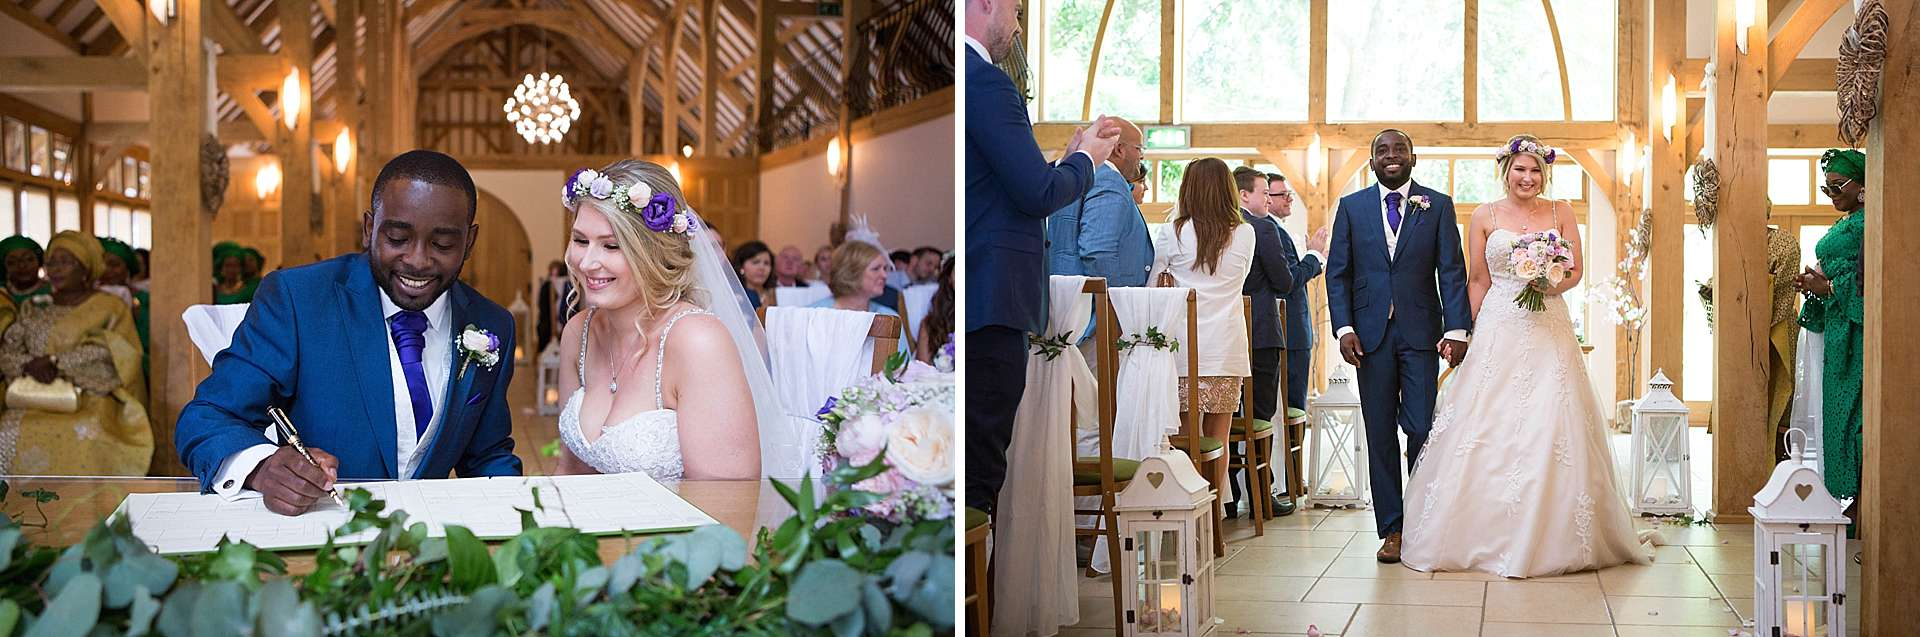 Rivervale wedding